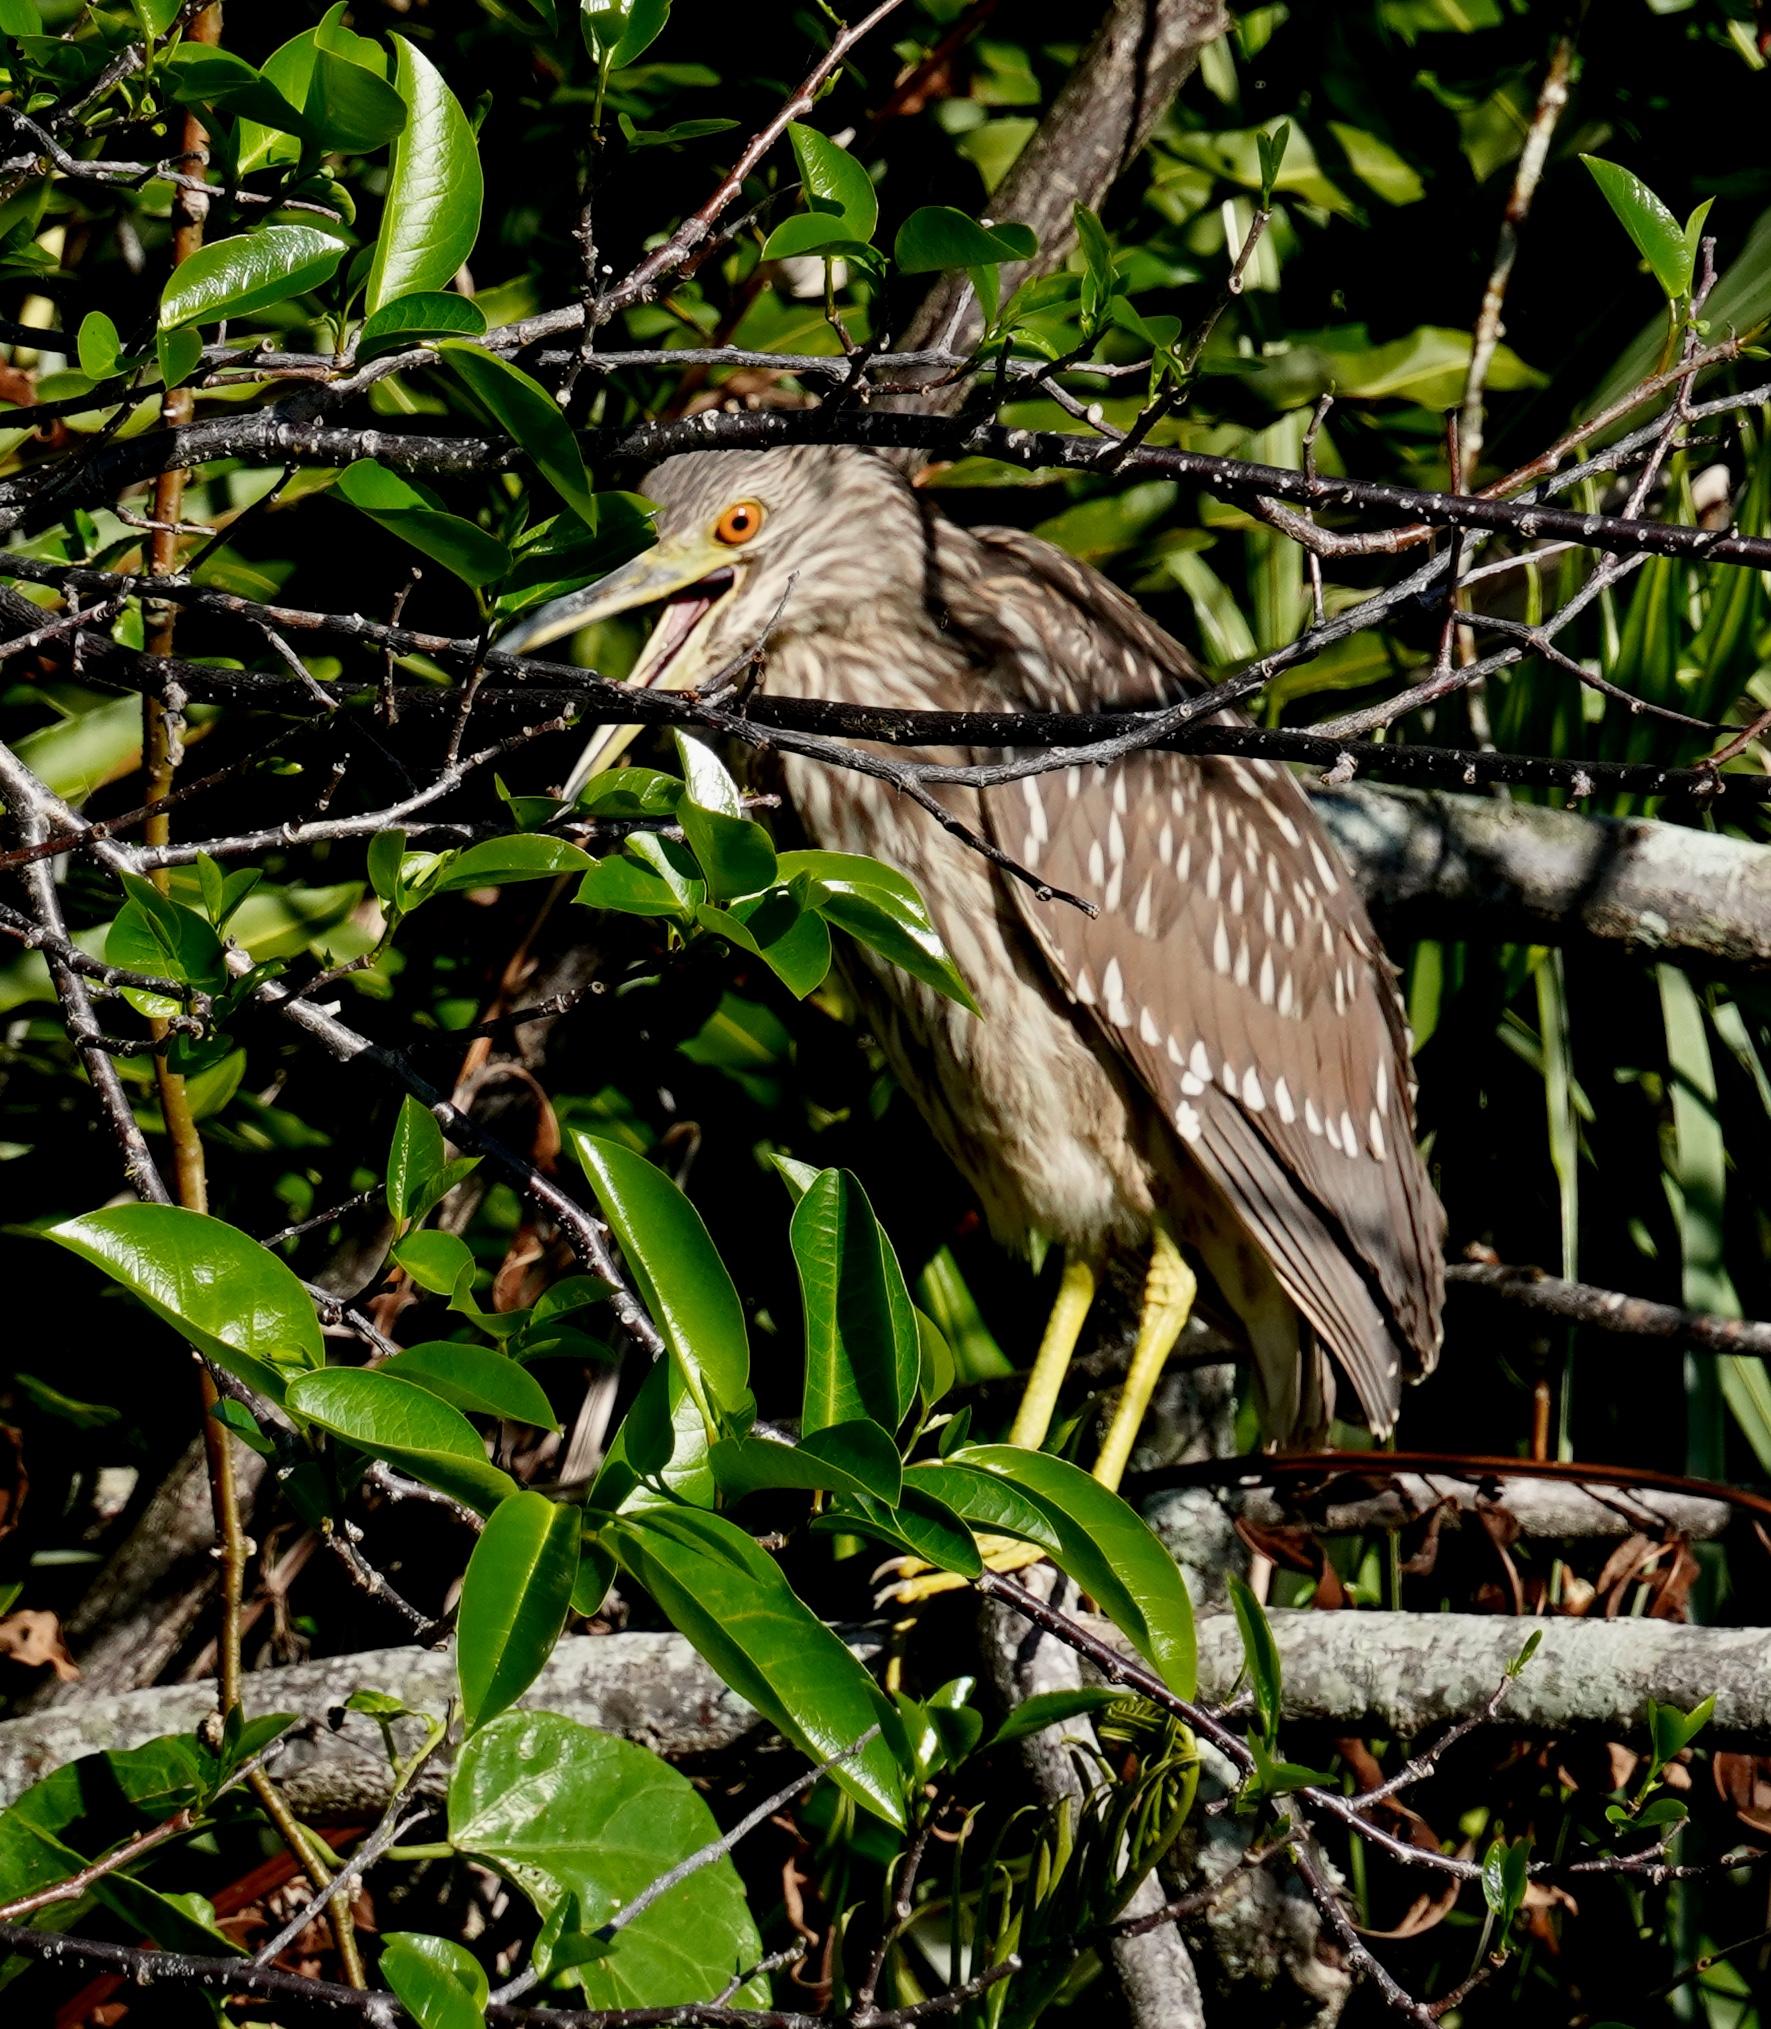 Black-crowned Night Heron, immature (LS)